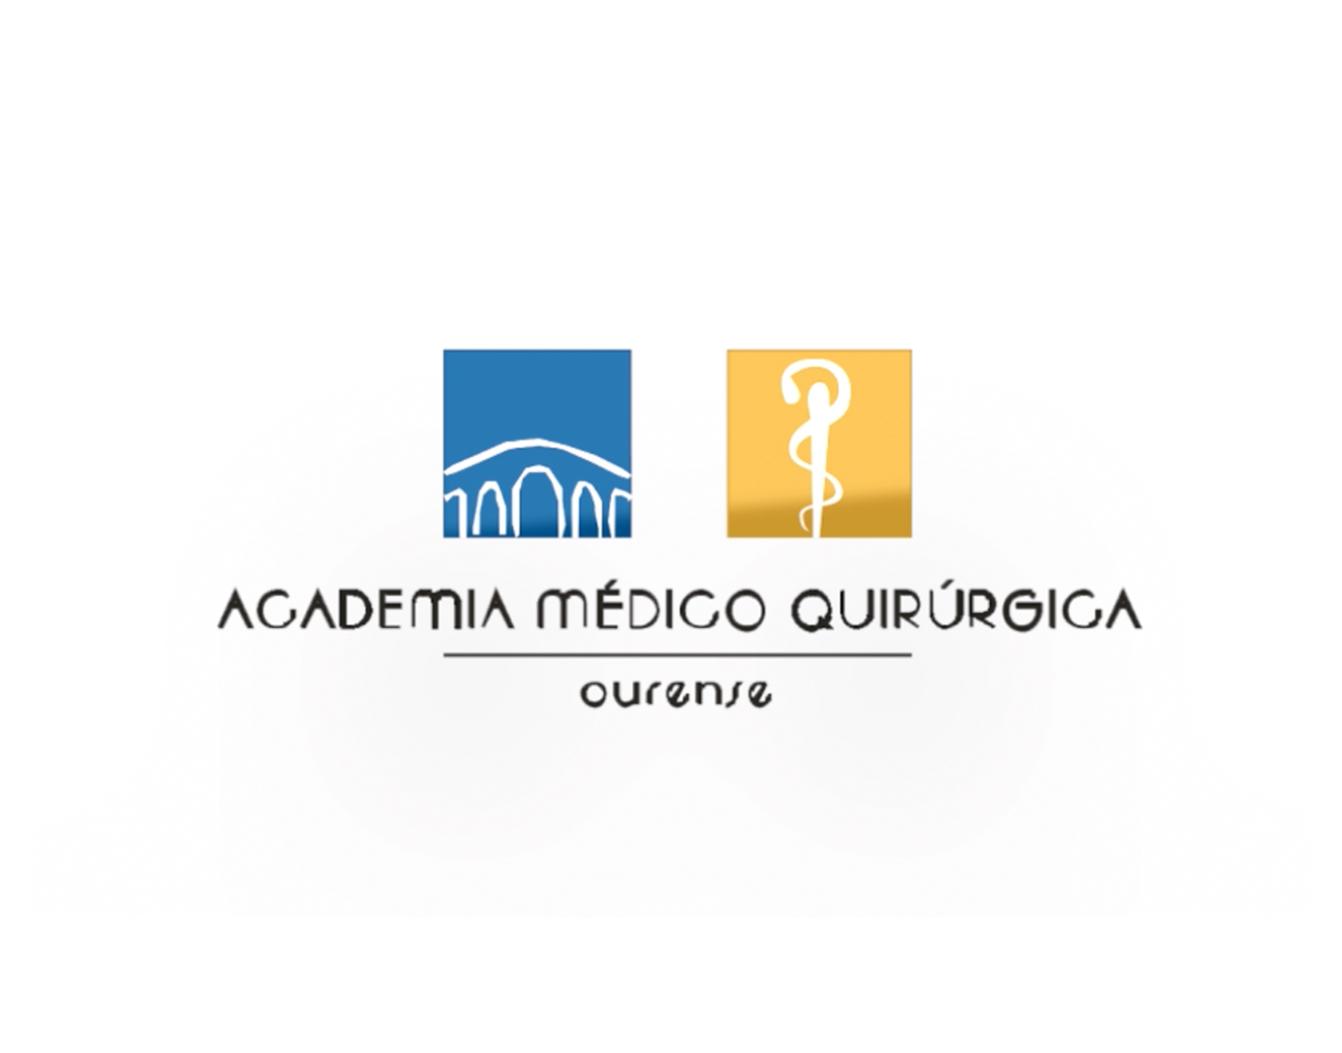 Academia Médico Quirúrgica